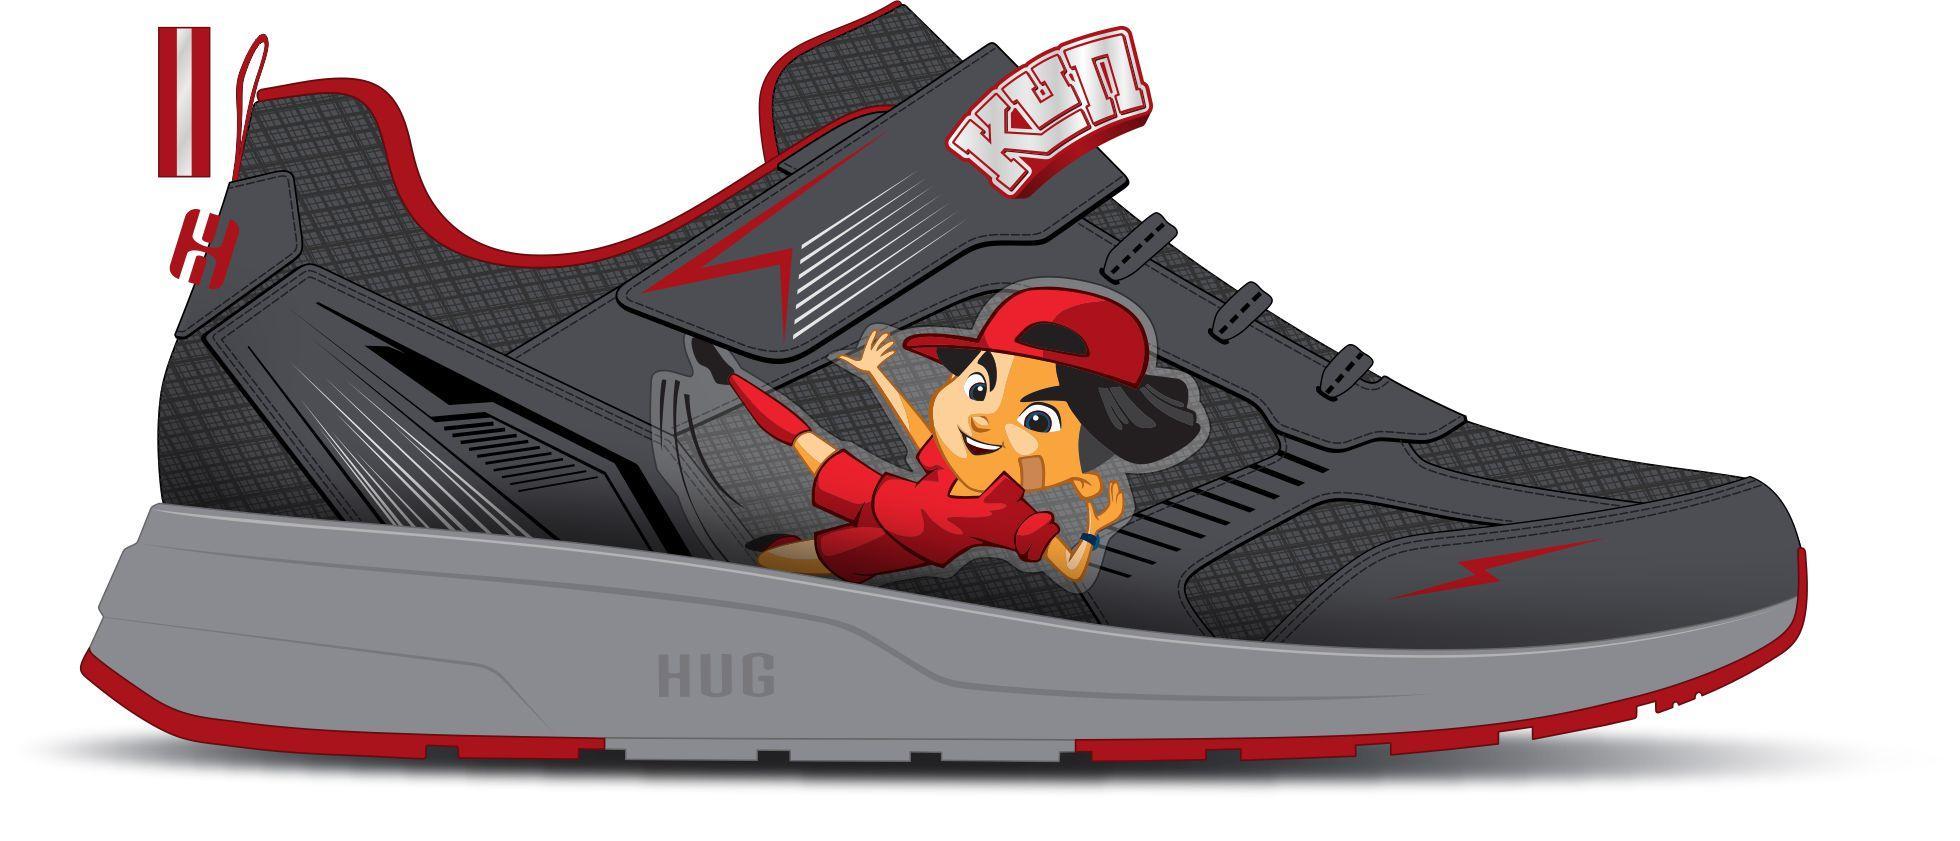 4. Giày CC xám